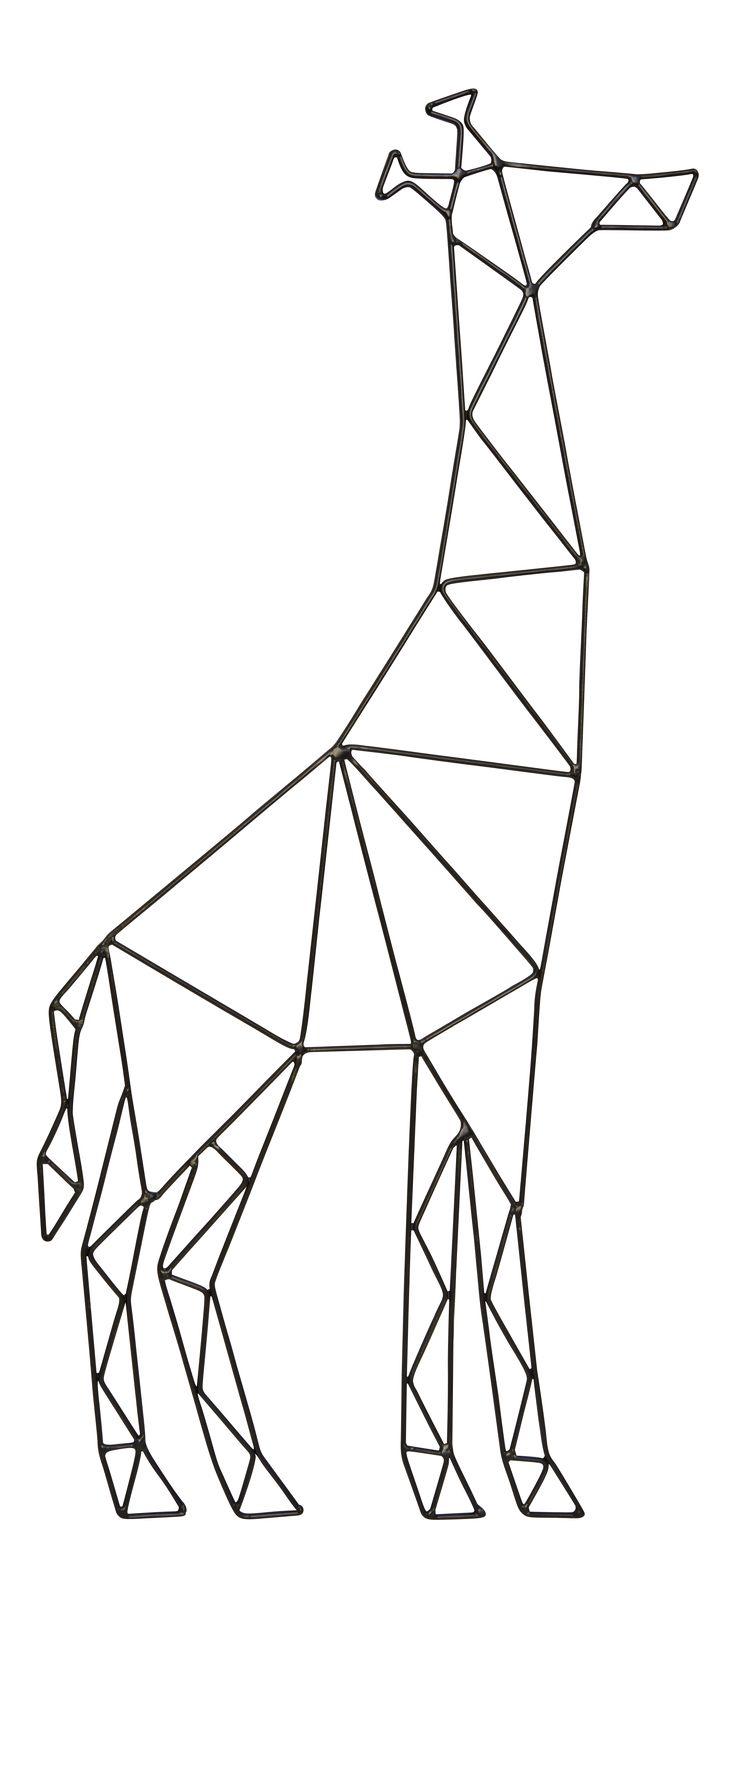 25 beste idee n over geometrische tekening op pinterest geometrische kunst geometrische. Black Bedroom Furniture Sets. Home Design Ideas